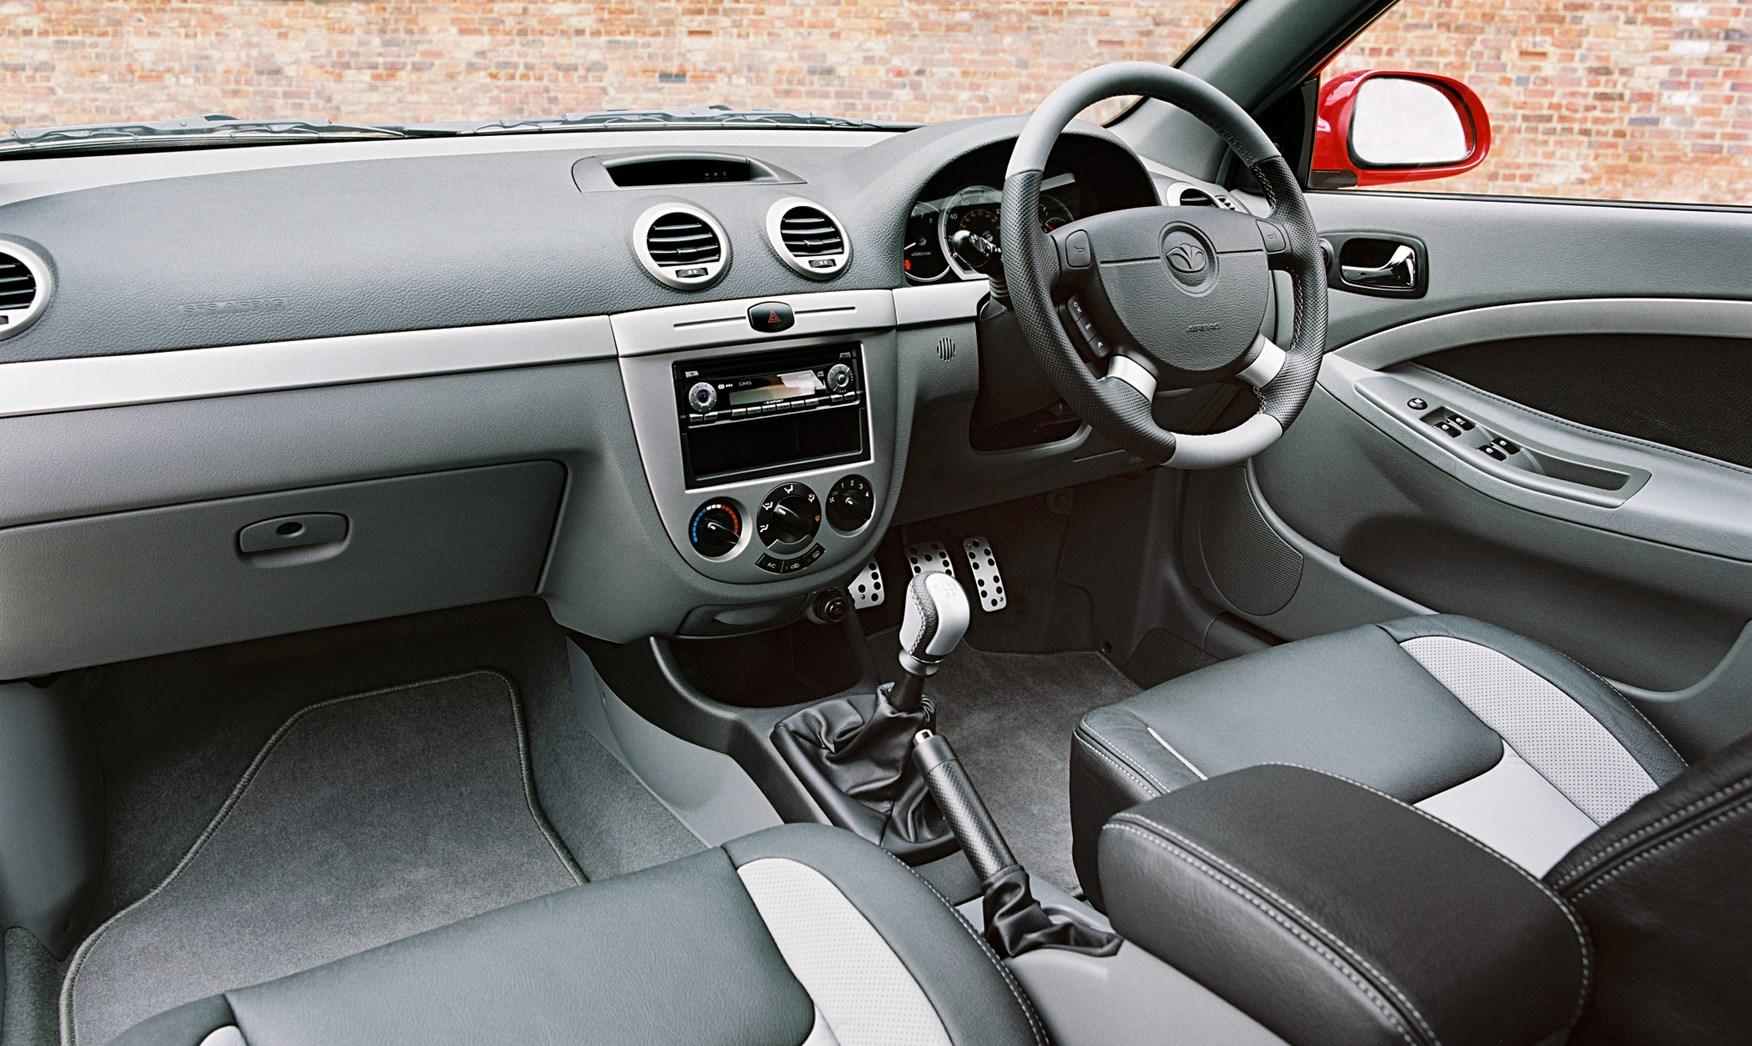 Chevrolet Lacetti Hatchback Review 2005 2011 Parkers